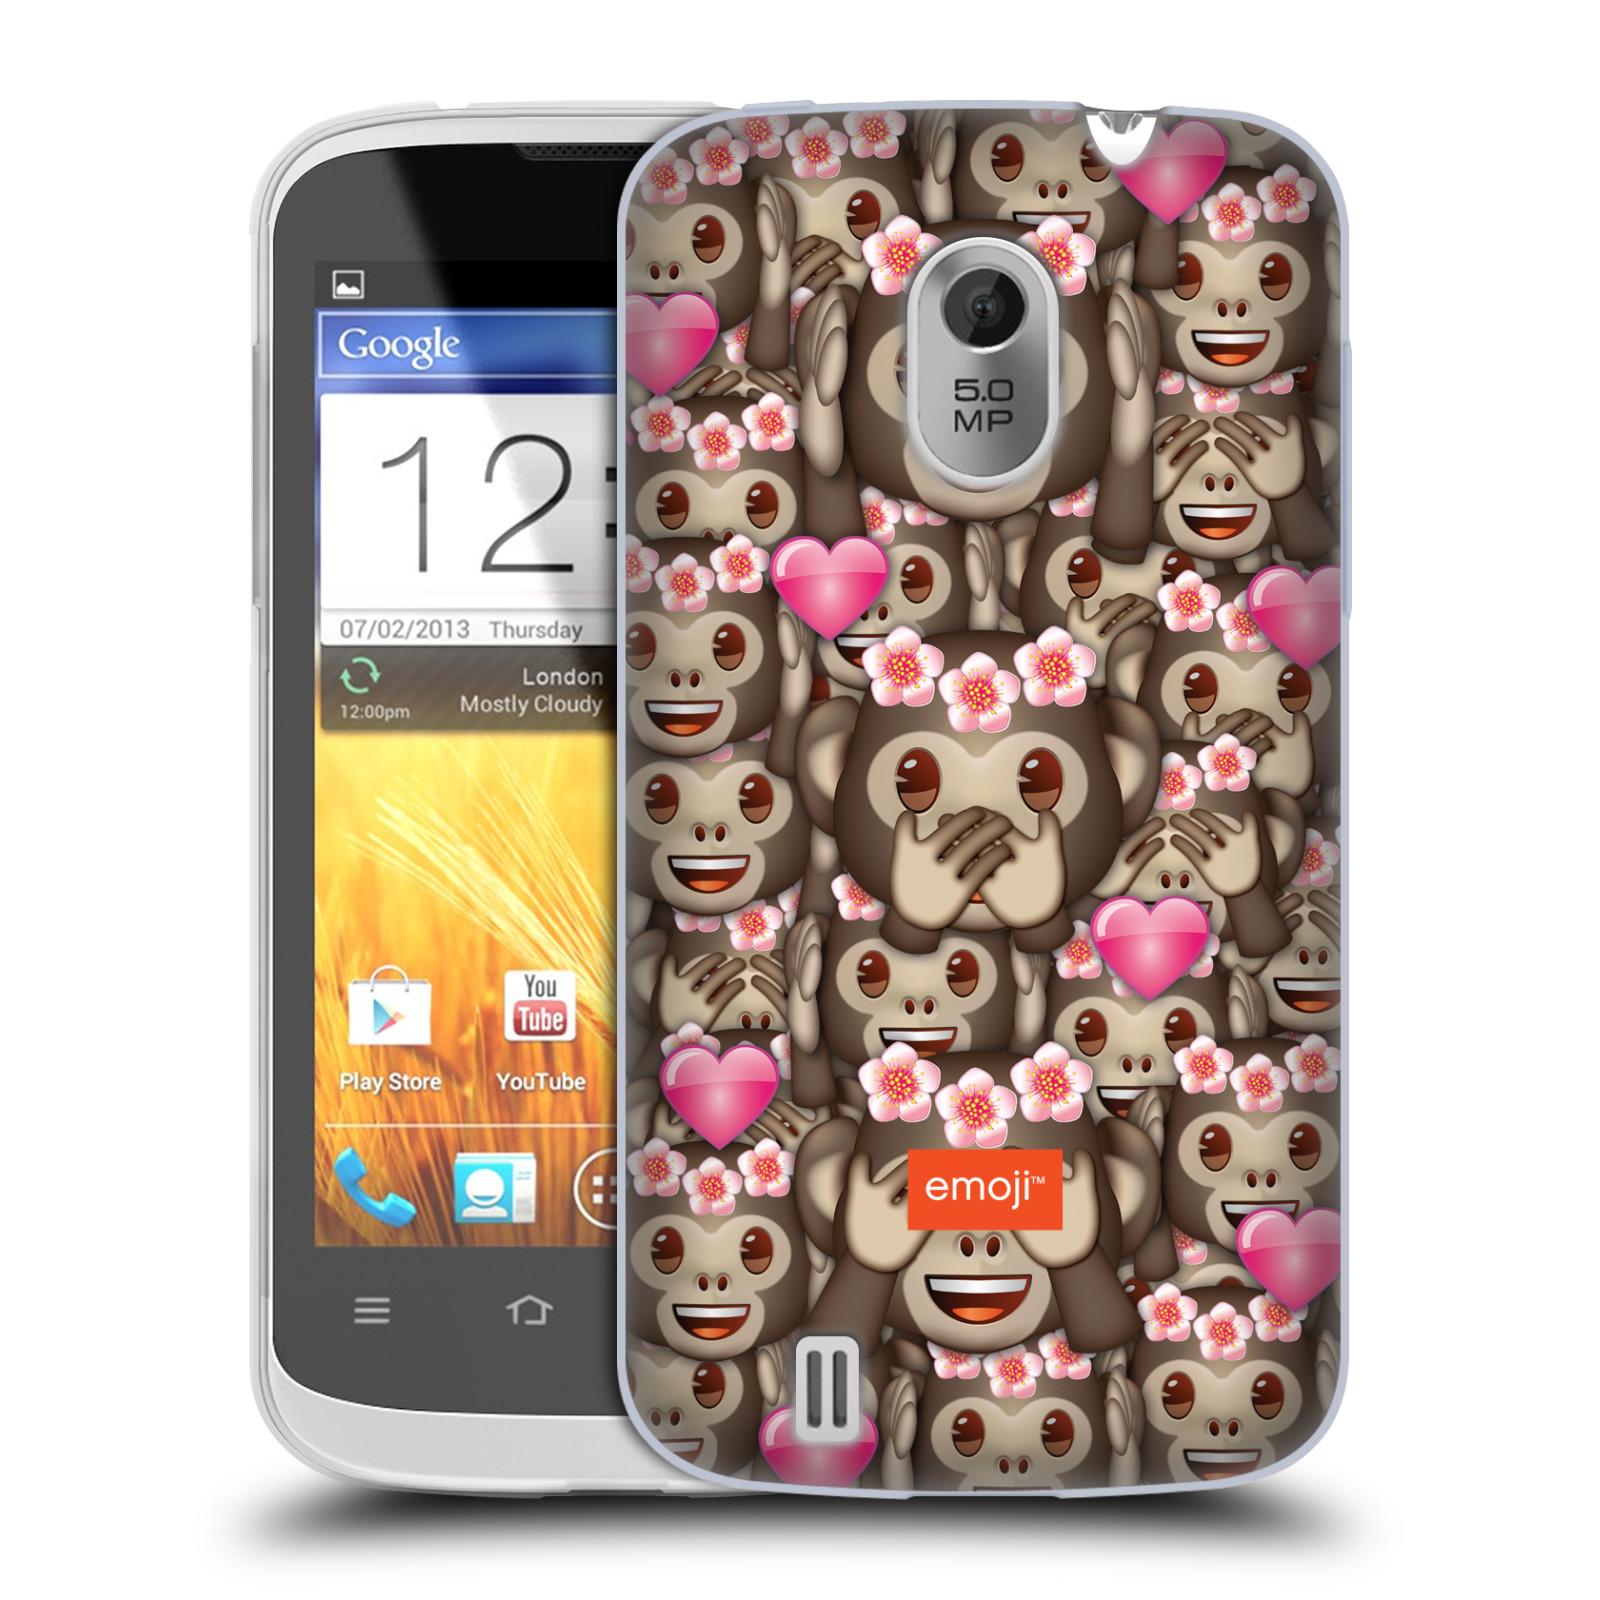 Silikonové pouzdro na mobil ZTE Blade III HEAD CASE EMOJI - Opičky, srdíčka a kytičky (Silikonový kryt či obal s oficiálním motivem EMOJI na mobilní telefon ZTE Blade 3)